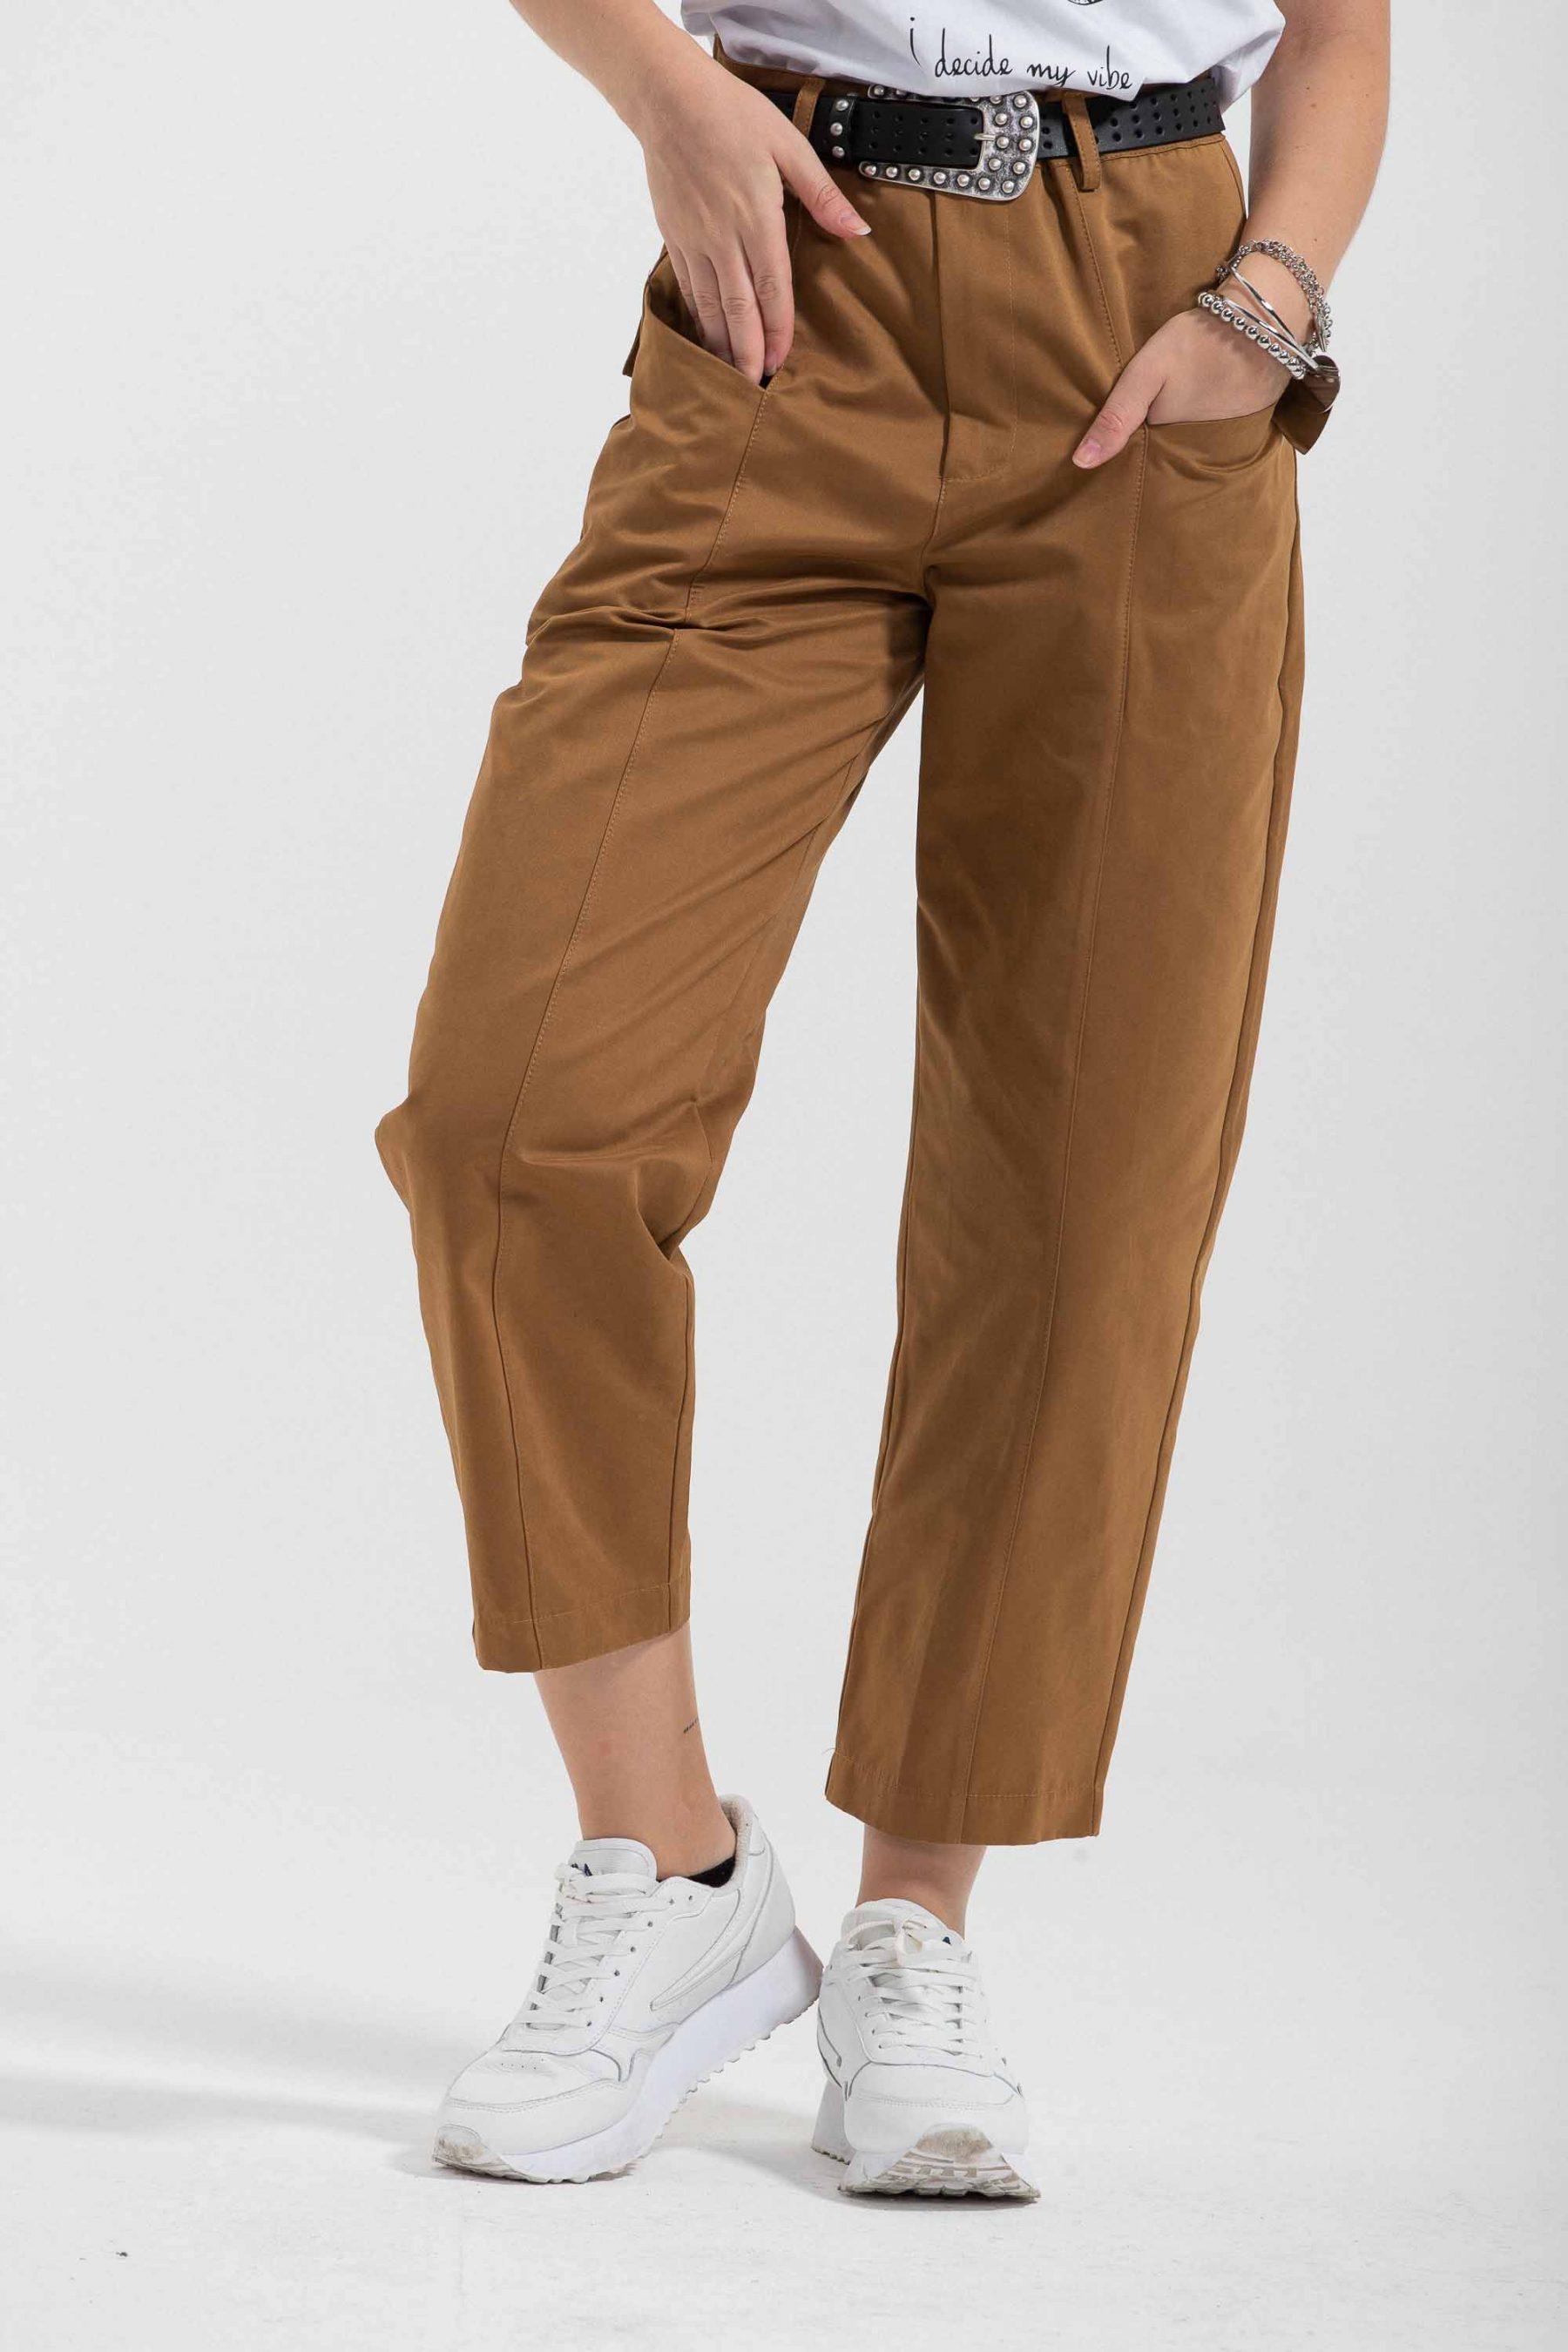 pantalone cargo con tasche